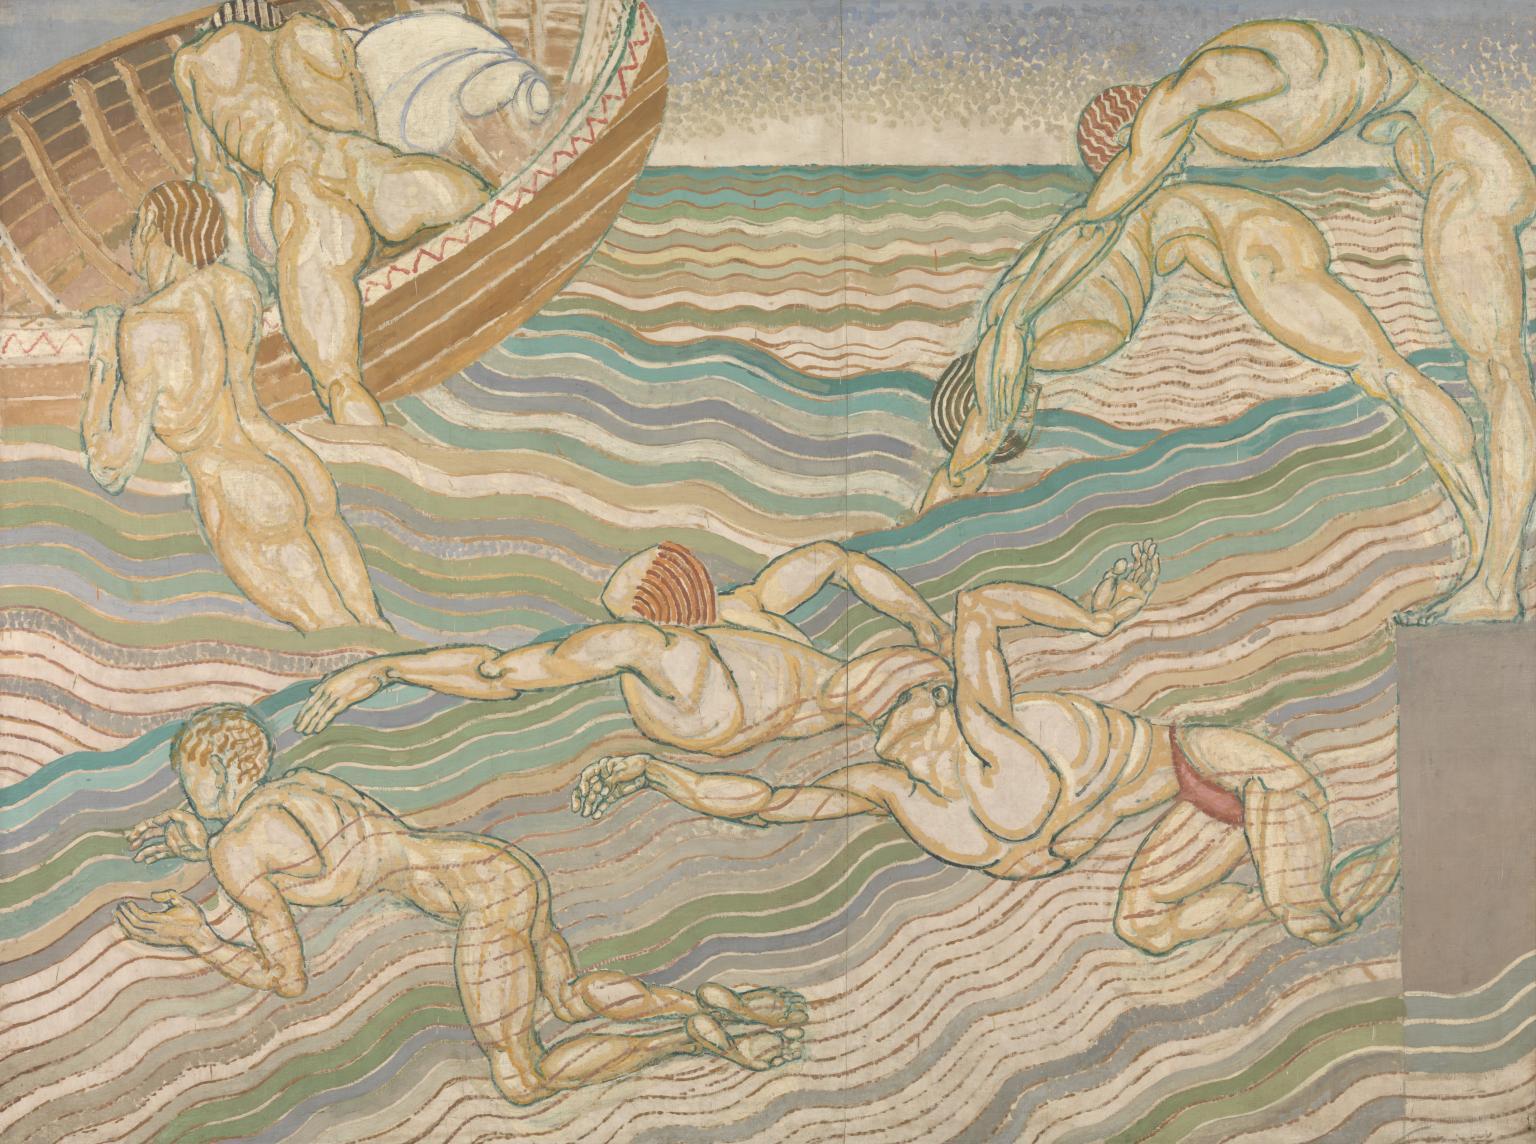 'Bathing' - Duncan Grant (1911)